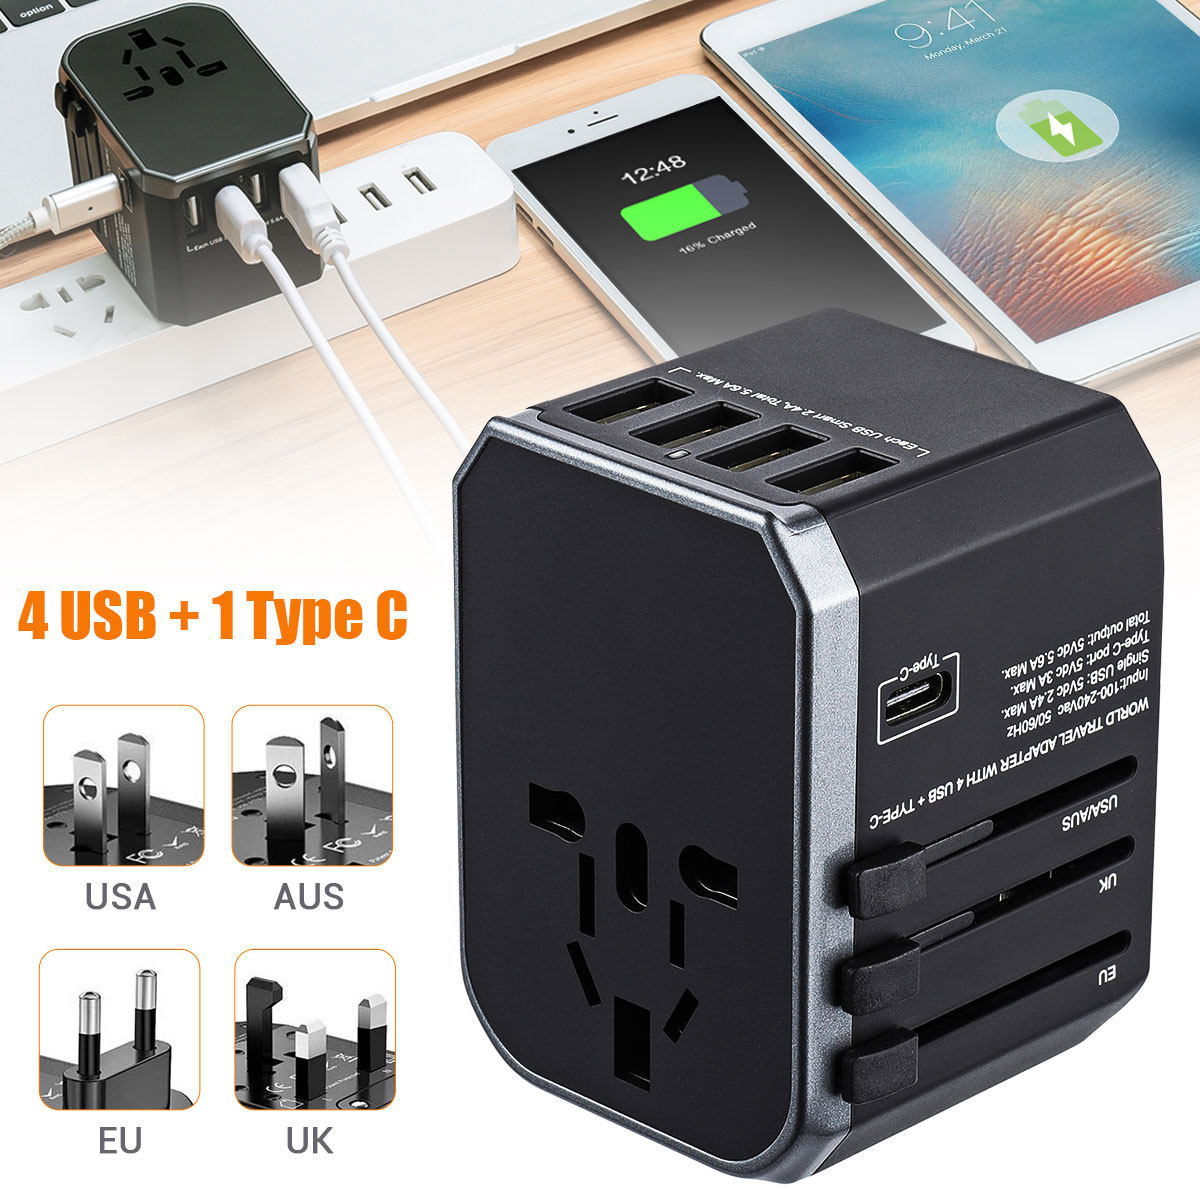 Reise Adapter Universal Power Adapter Ladegerät 4 USB 2.4A Port + Typ-C Weltweit Adapter Wand Elektrische Stecker und Steckdosen konverter